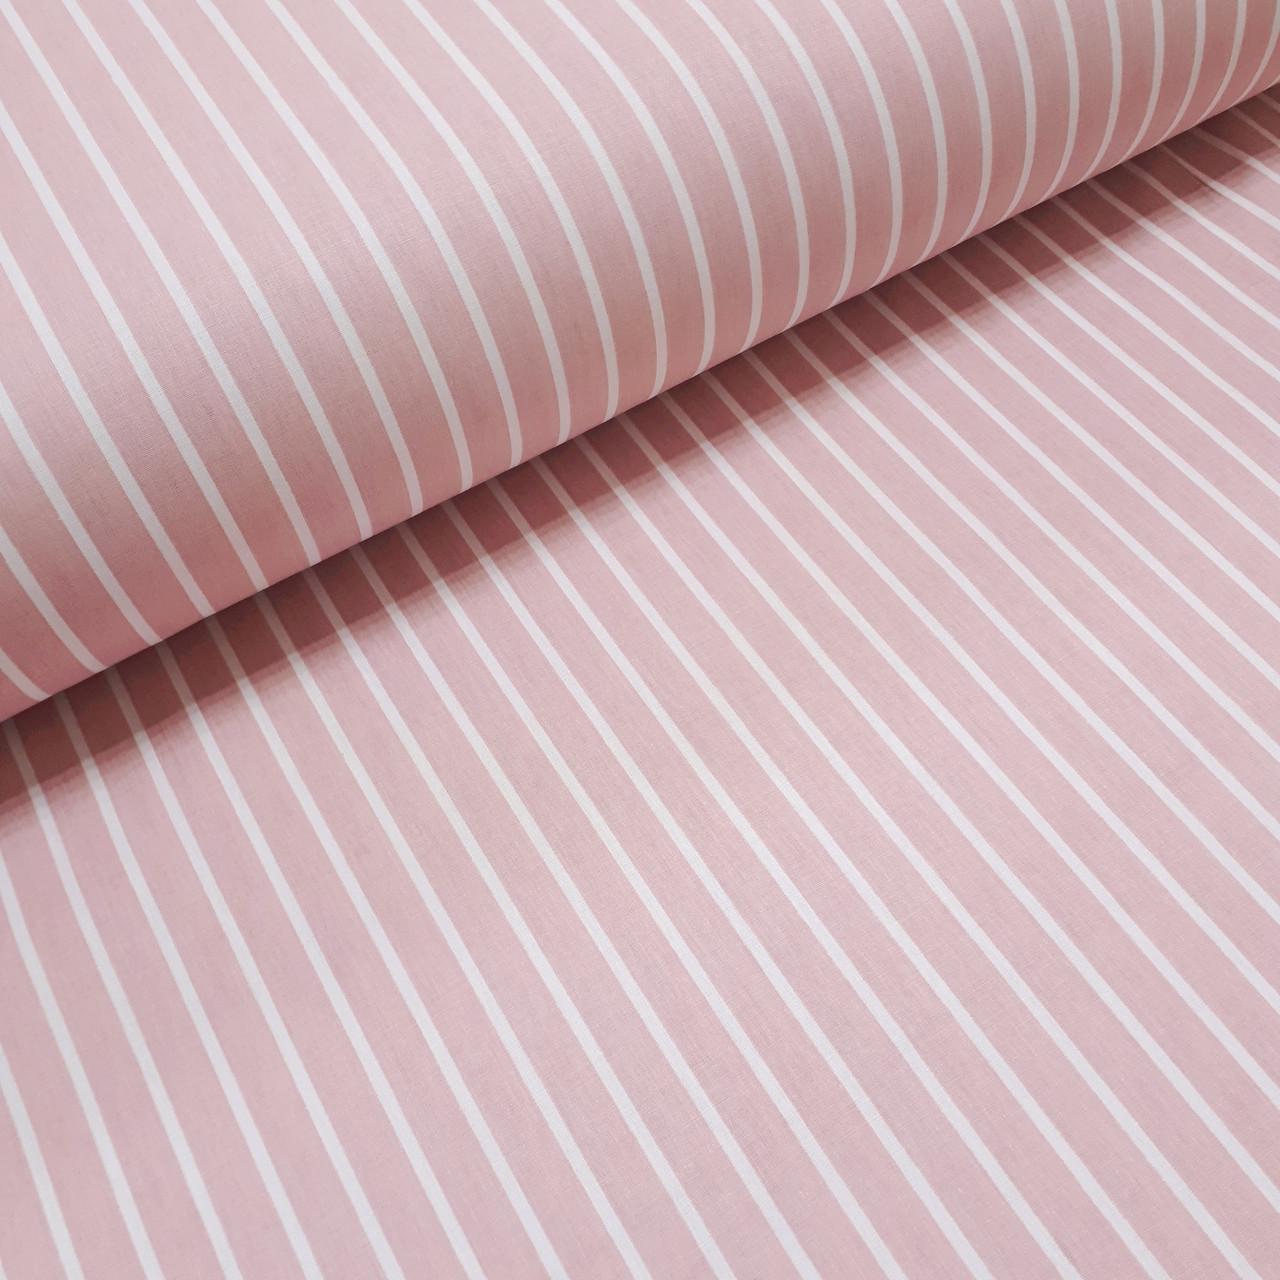 Ткань поплин с белой полоской на пудро-розовом (ТУРЦИЯ шир. 2,4 м) №32-56